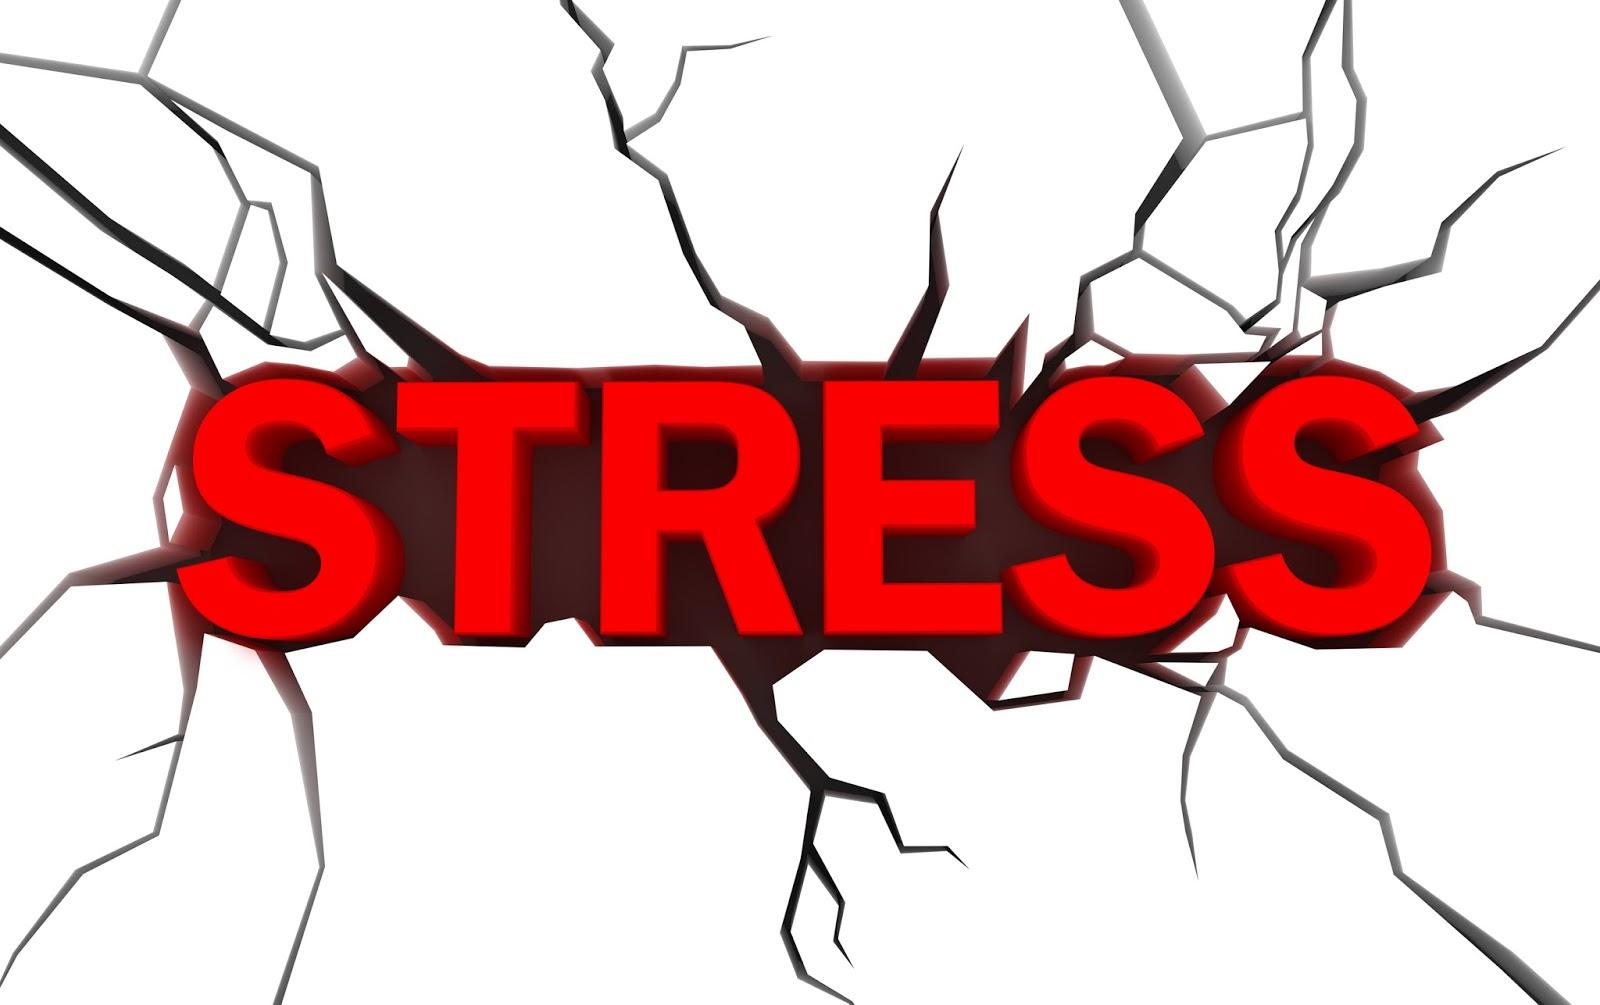 stresss